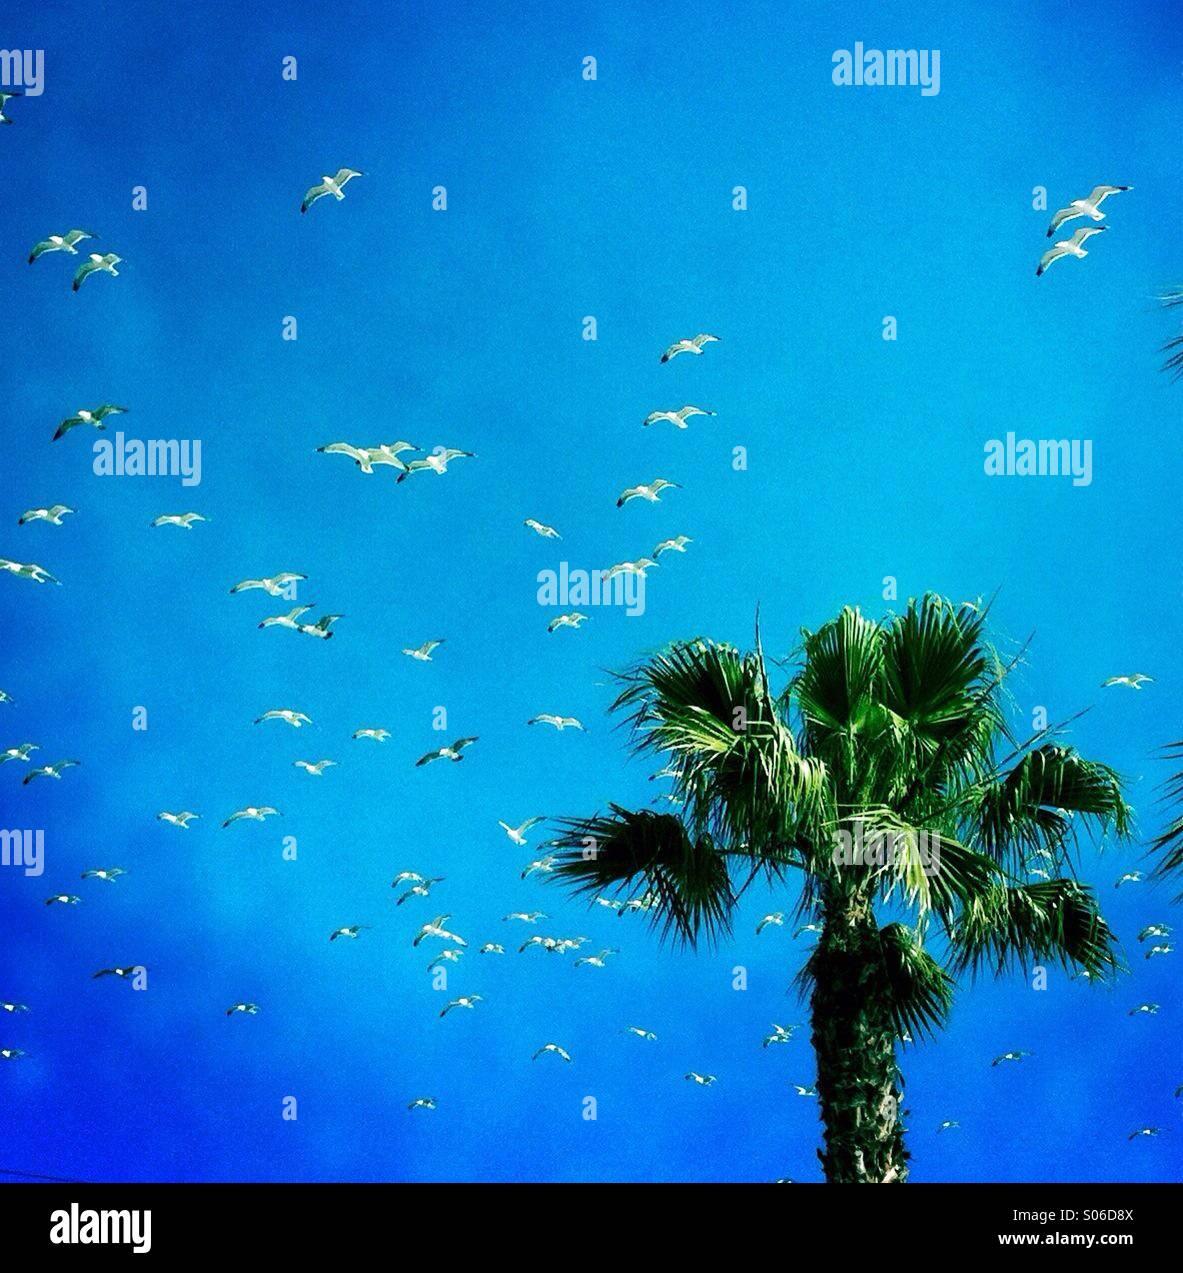 A palm tree and seagulls flying. Manhattan beach, California USA. - Stock Image